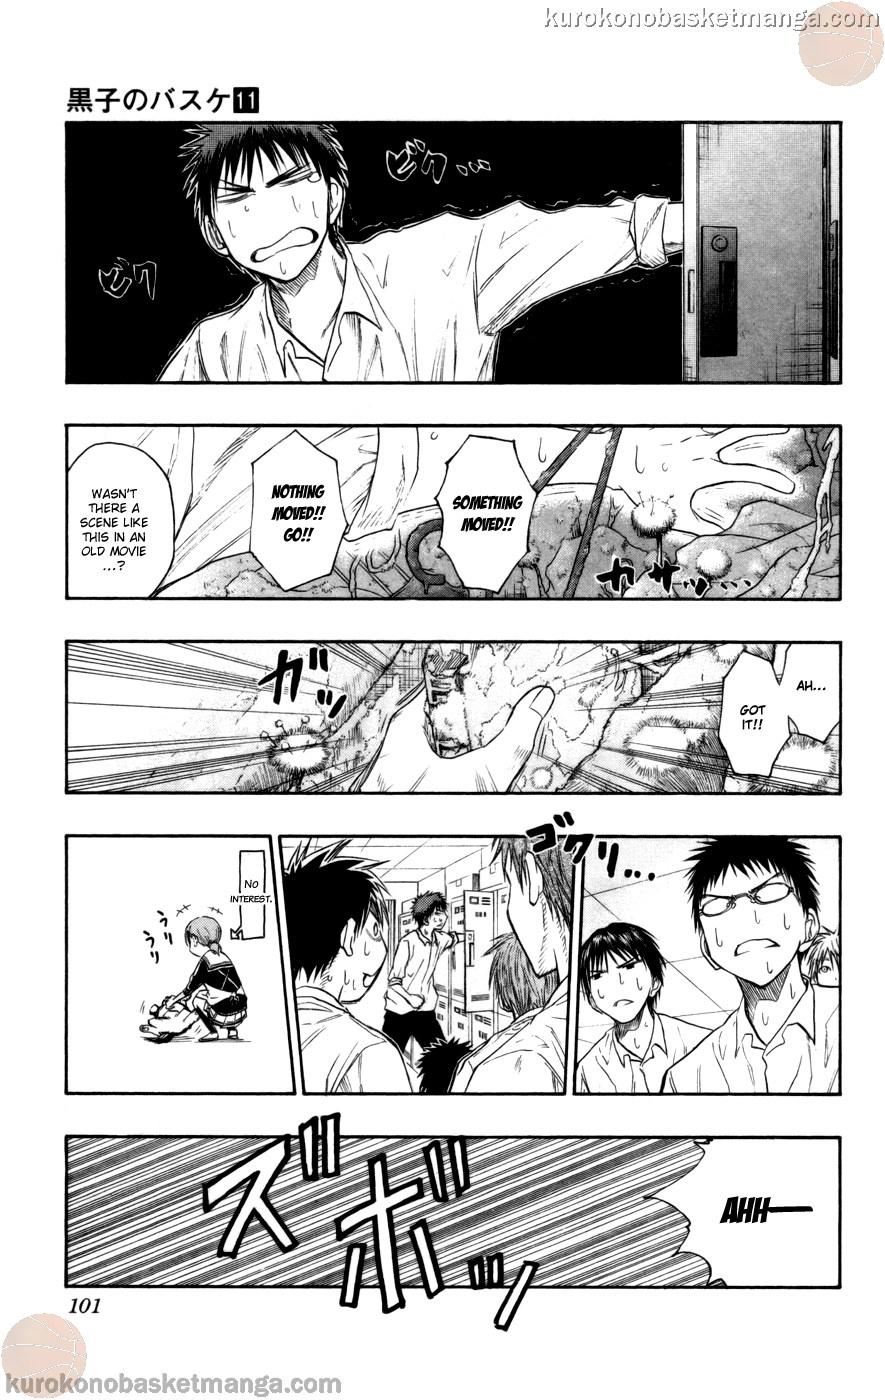 Kuroko no Basket Manga Chapter 94 - Image 17